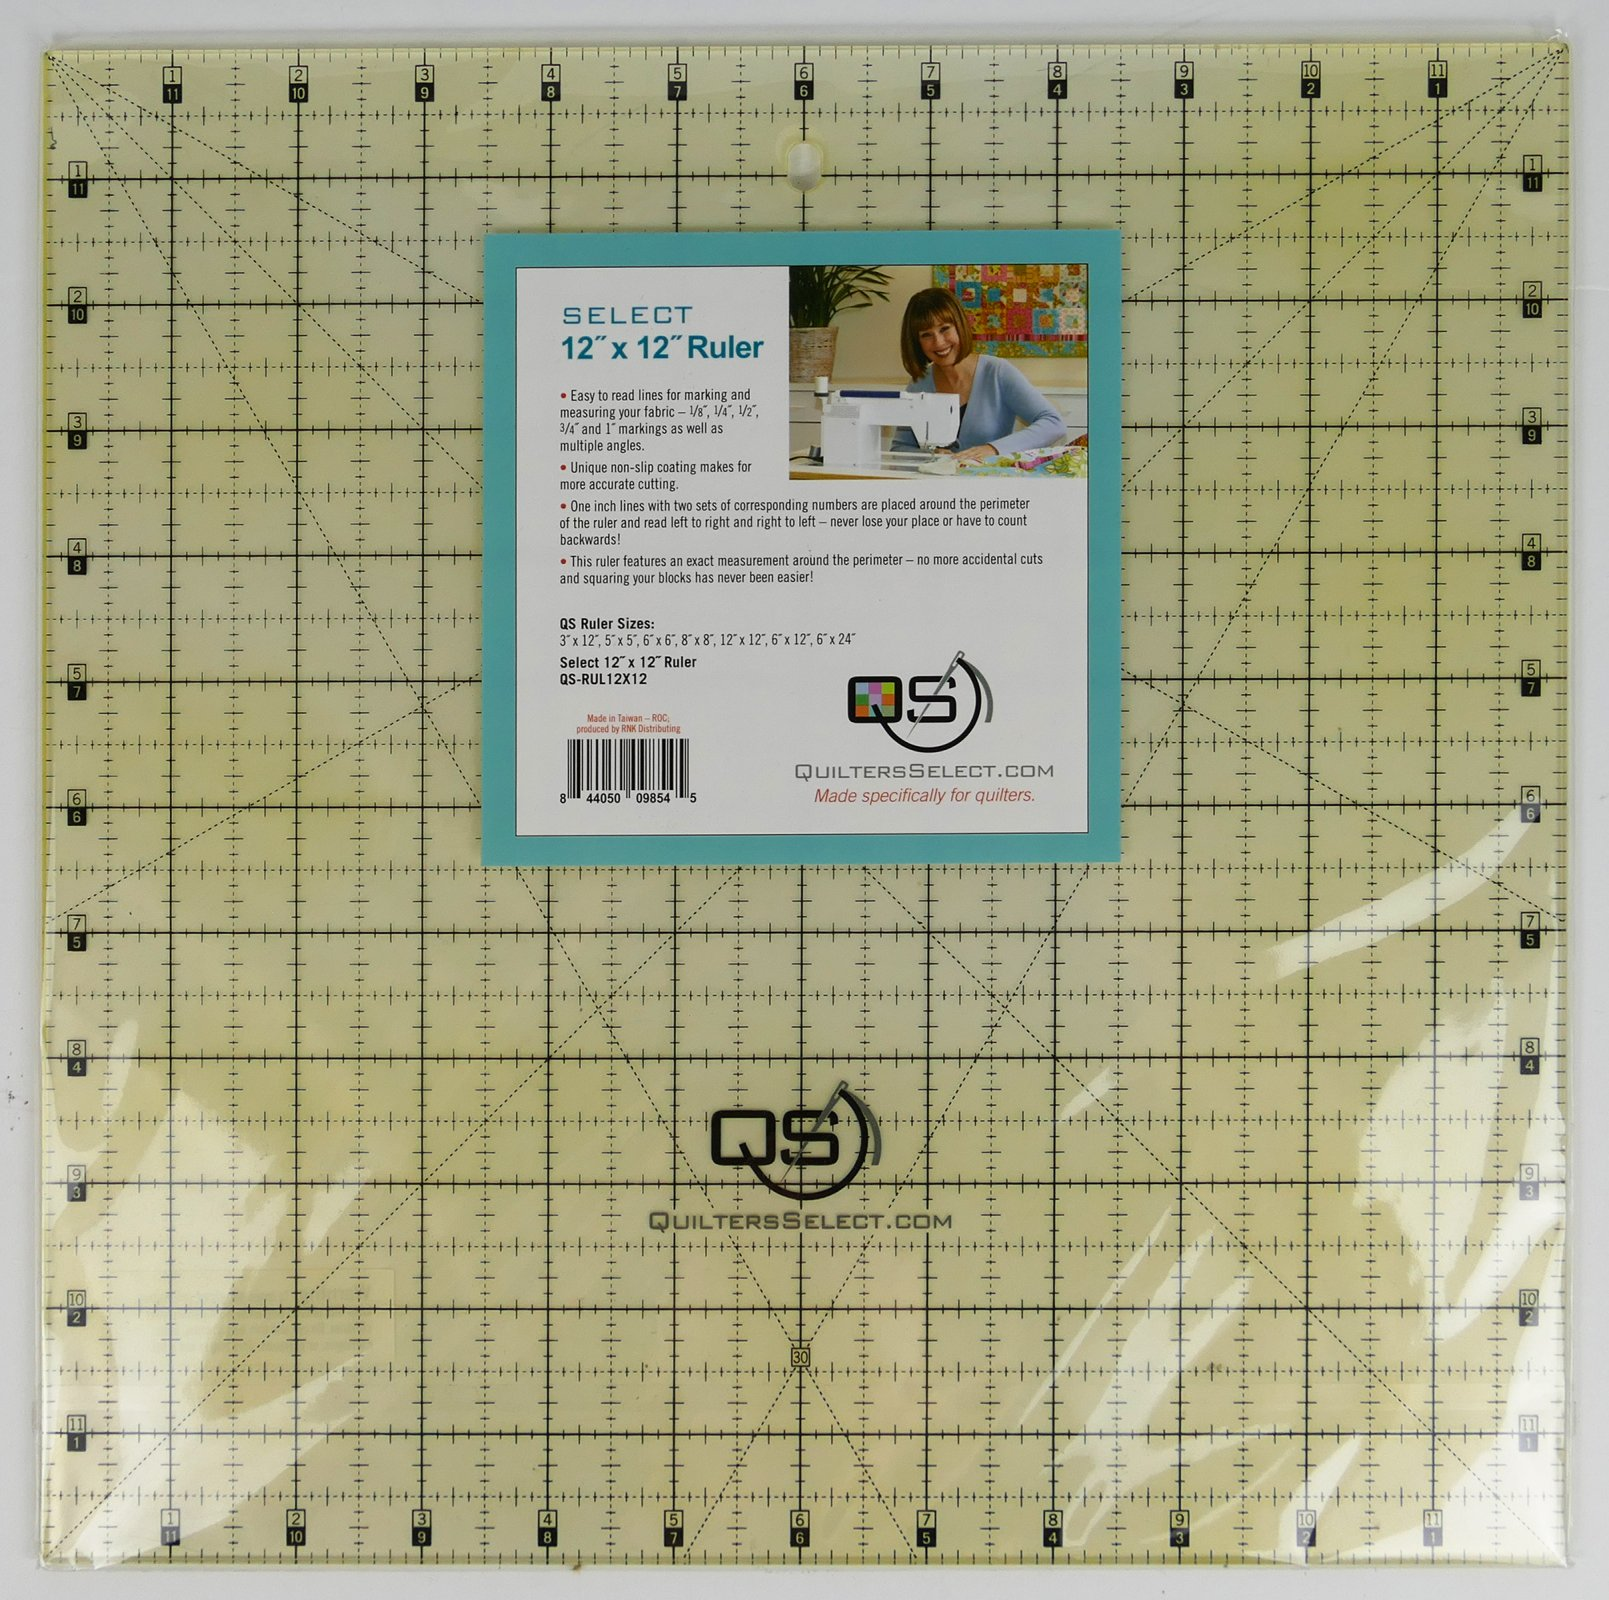 QS Select 12 x 12 Non-Slip Ruler